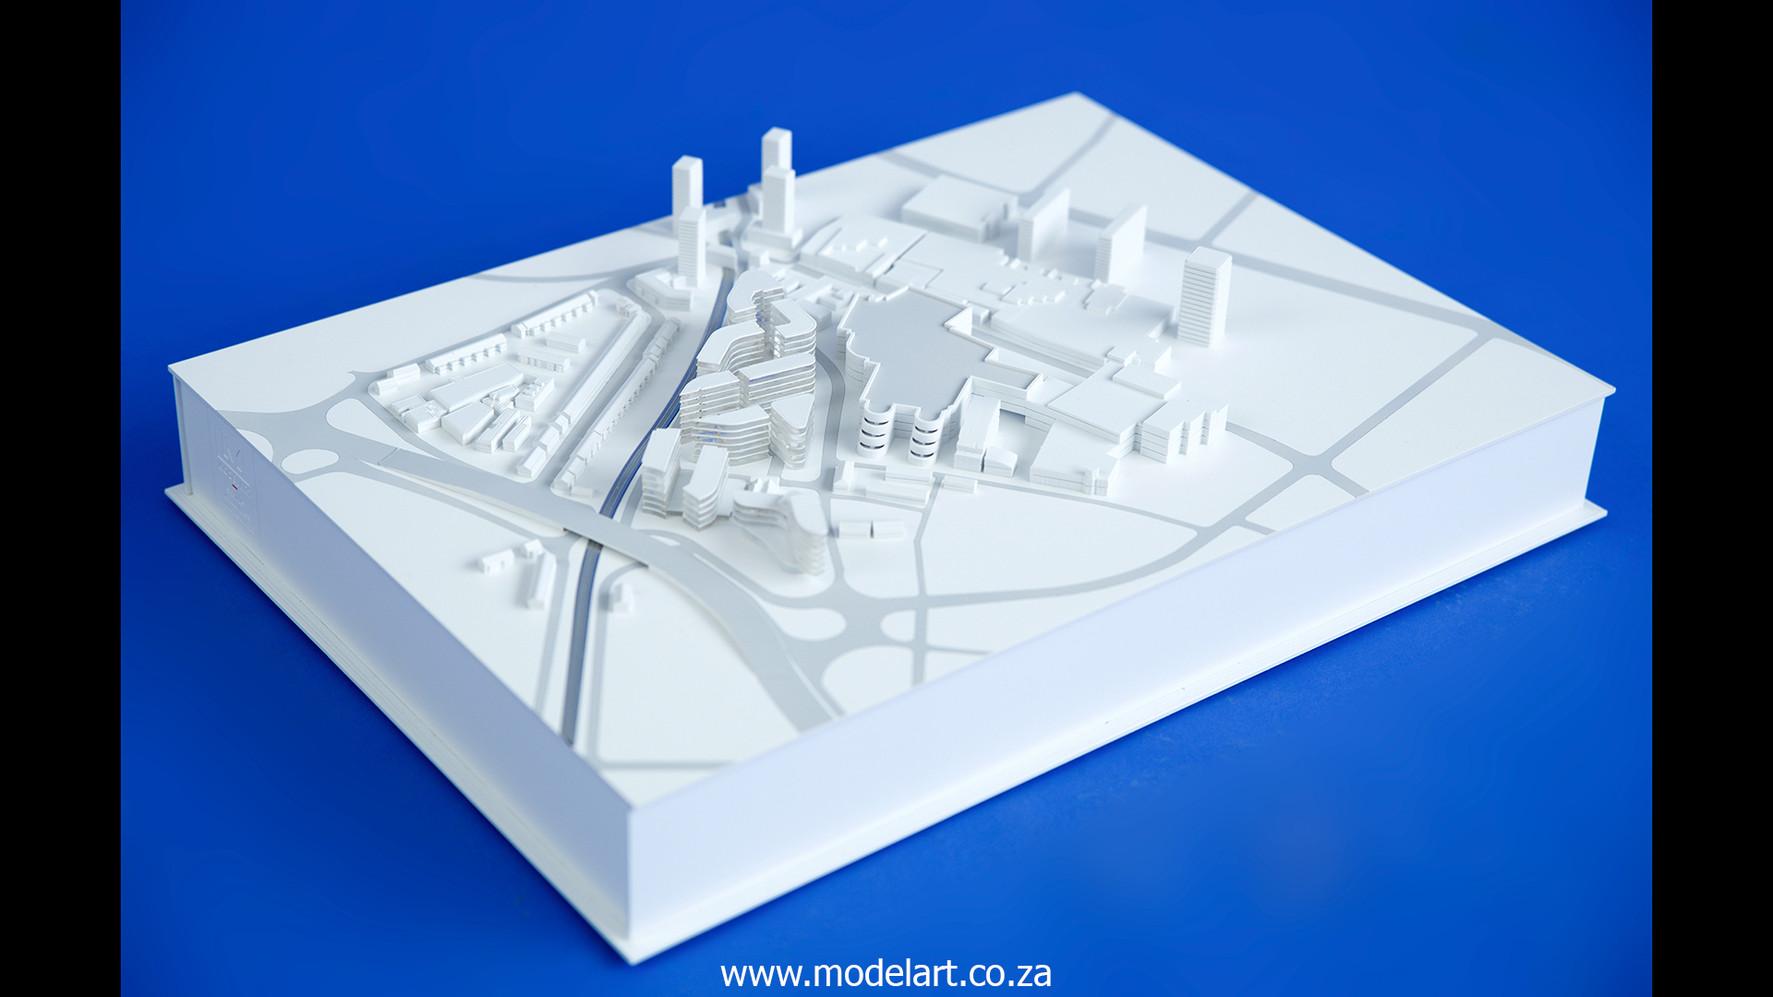 Architectural-Scale-Model-Conceptual-Croydon-5